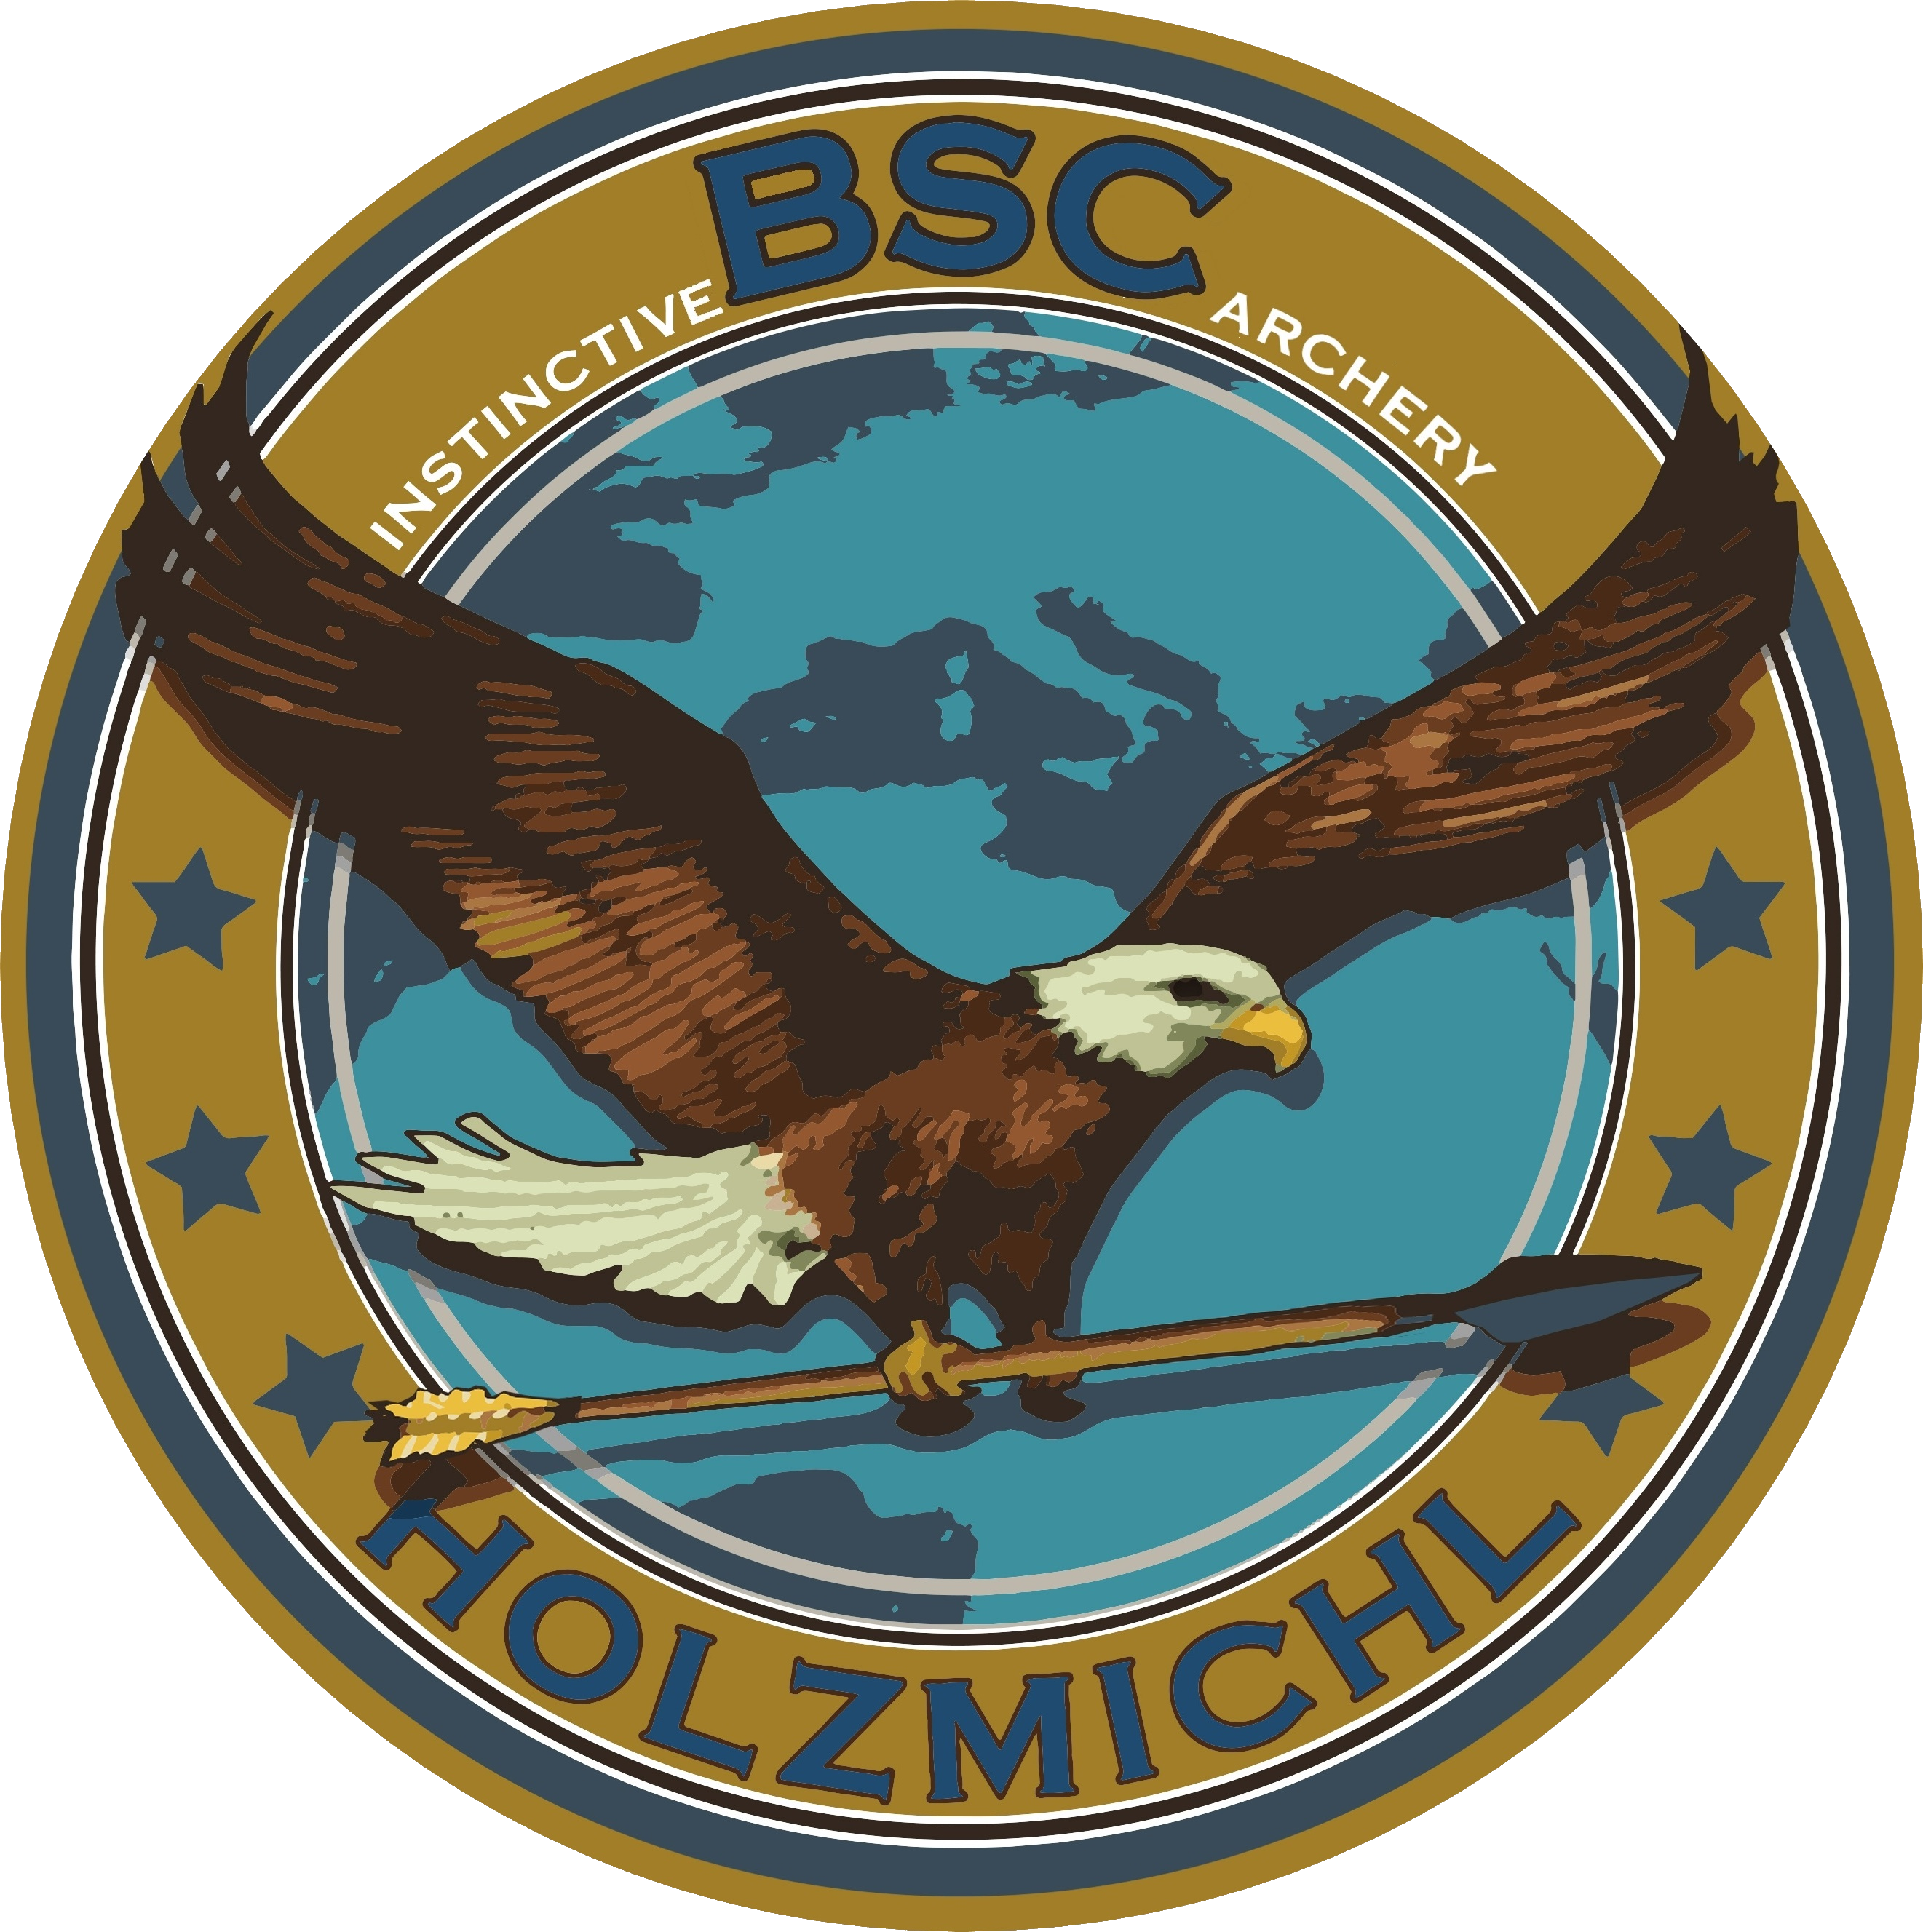 BSC Holzmichl